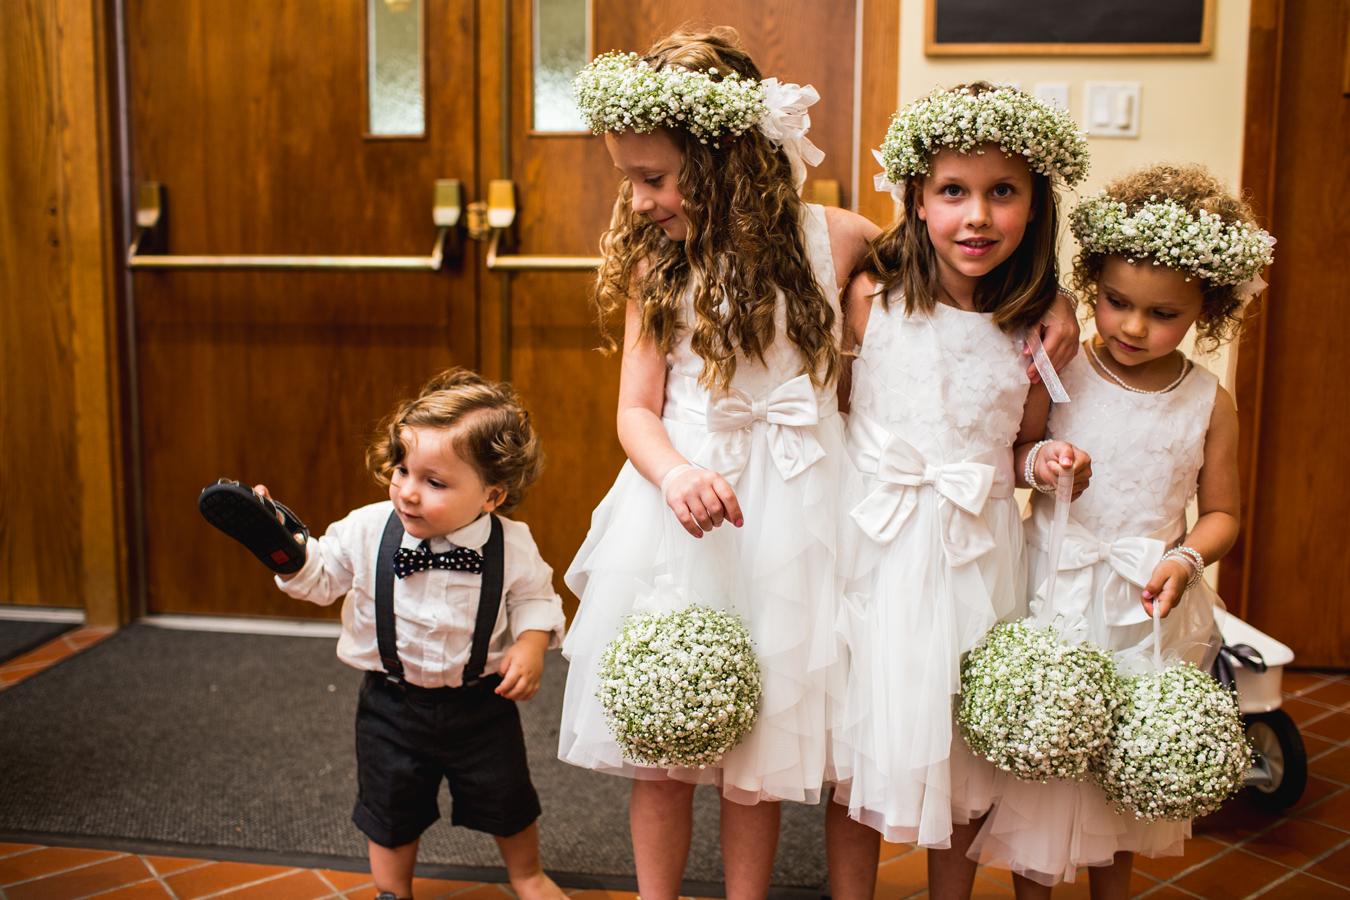 Ð?аÑ?Ñ?инки по запÑ?оÑ?Ñ? children at wedding